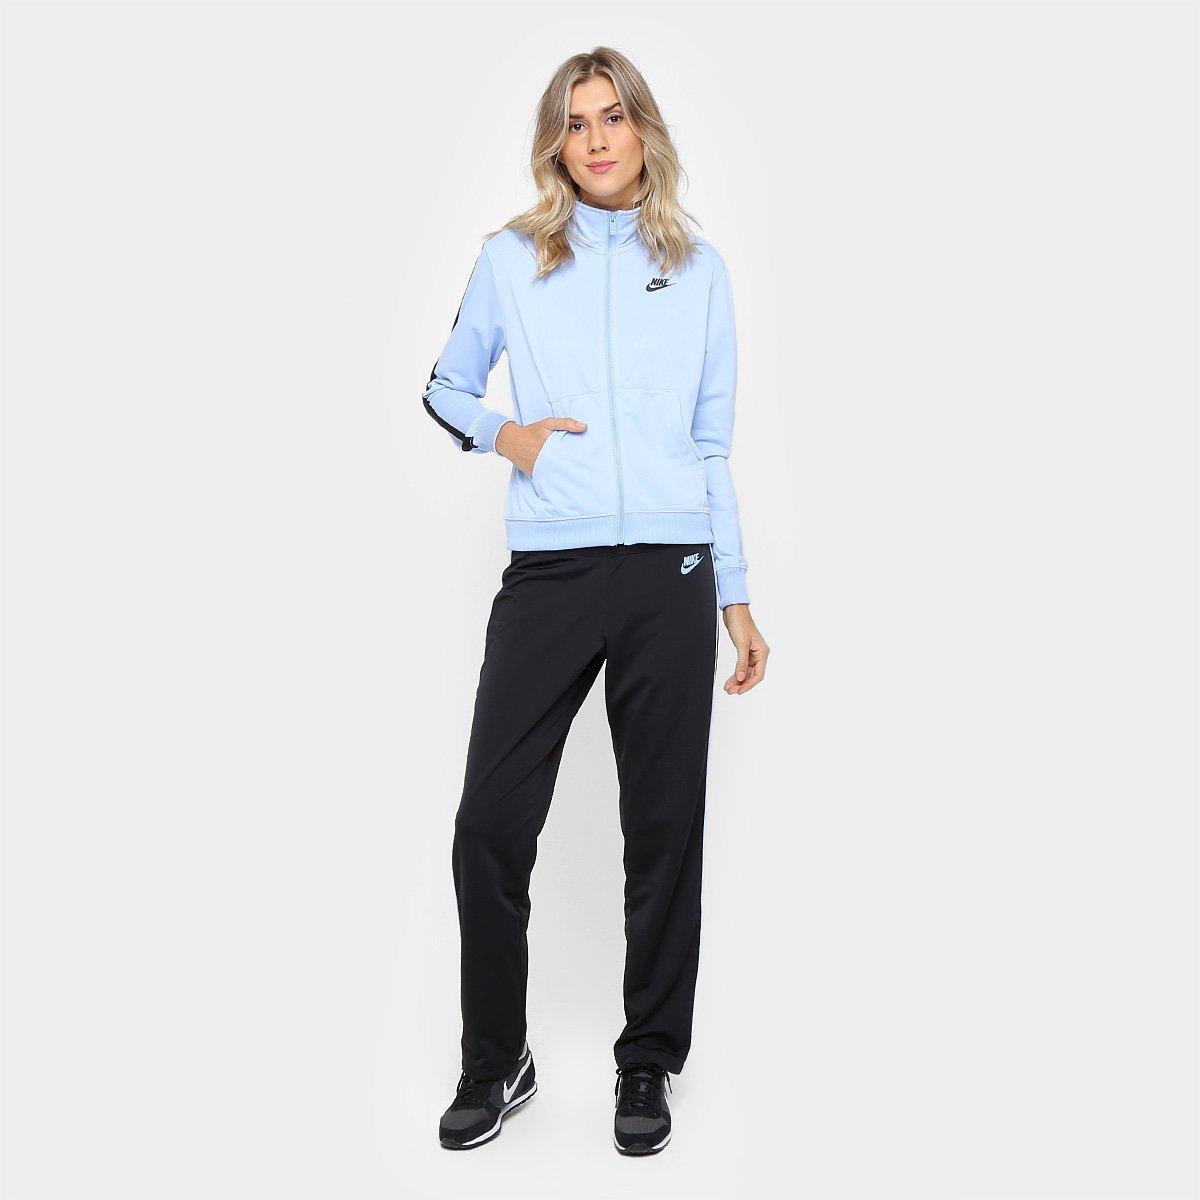 c5dd89fce6 Agasalho Nike Pk Oh Feminino - Azul Claro - Compre Agora